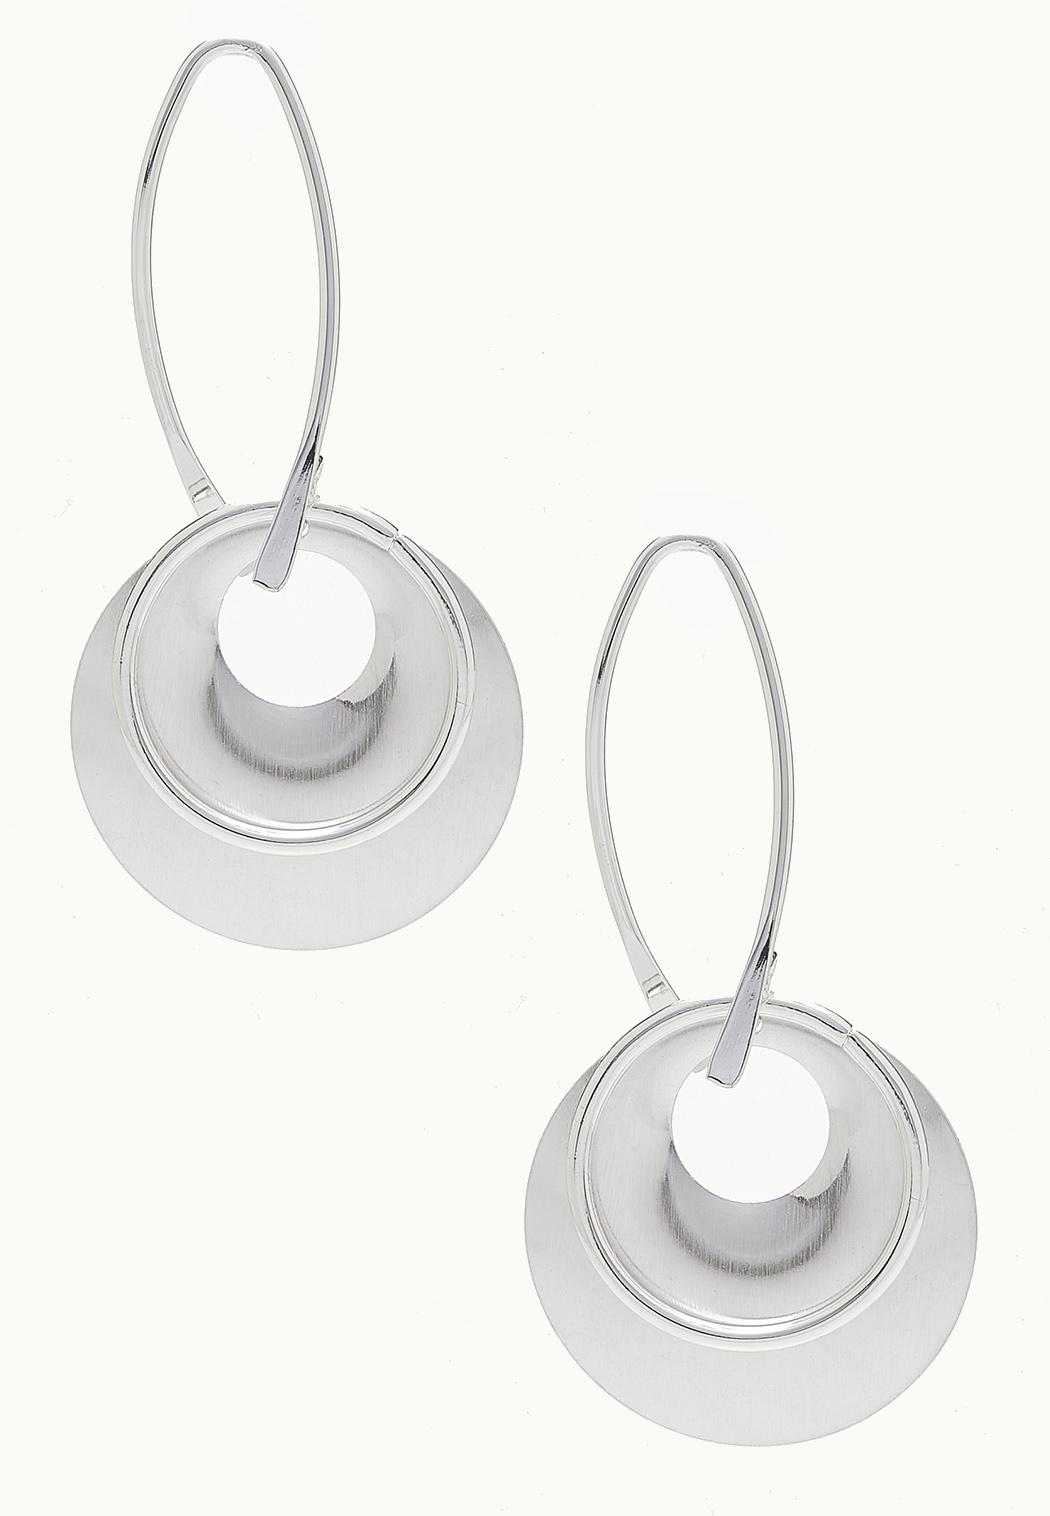 Mod Hoop Dangle Earrings